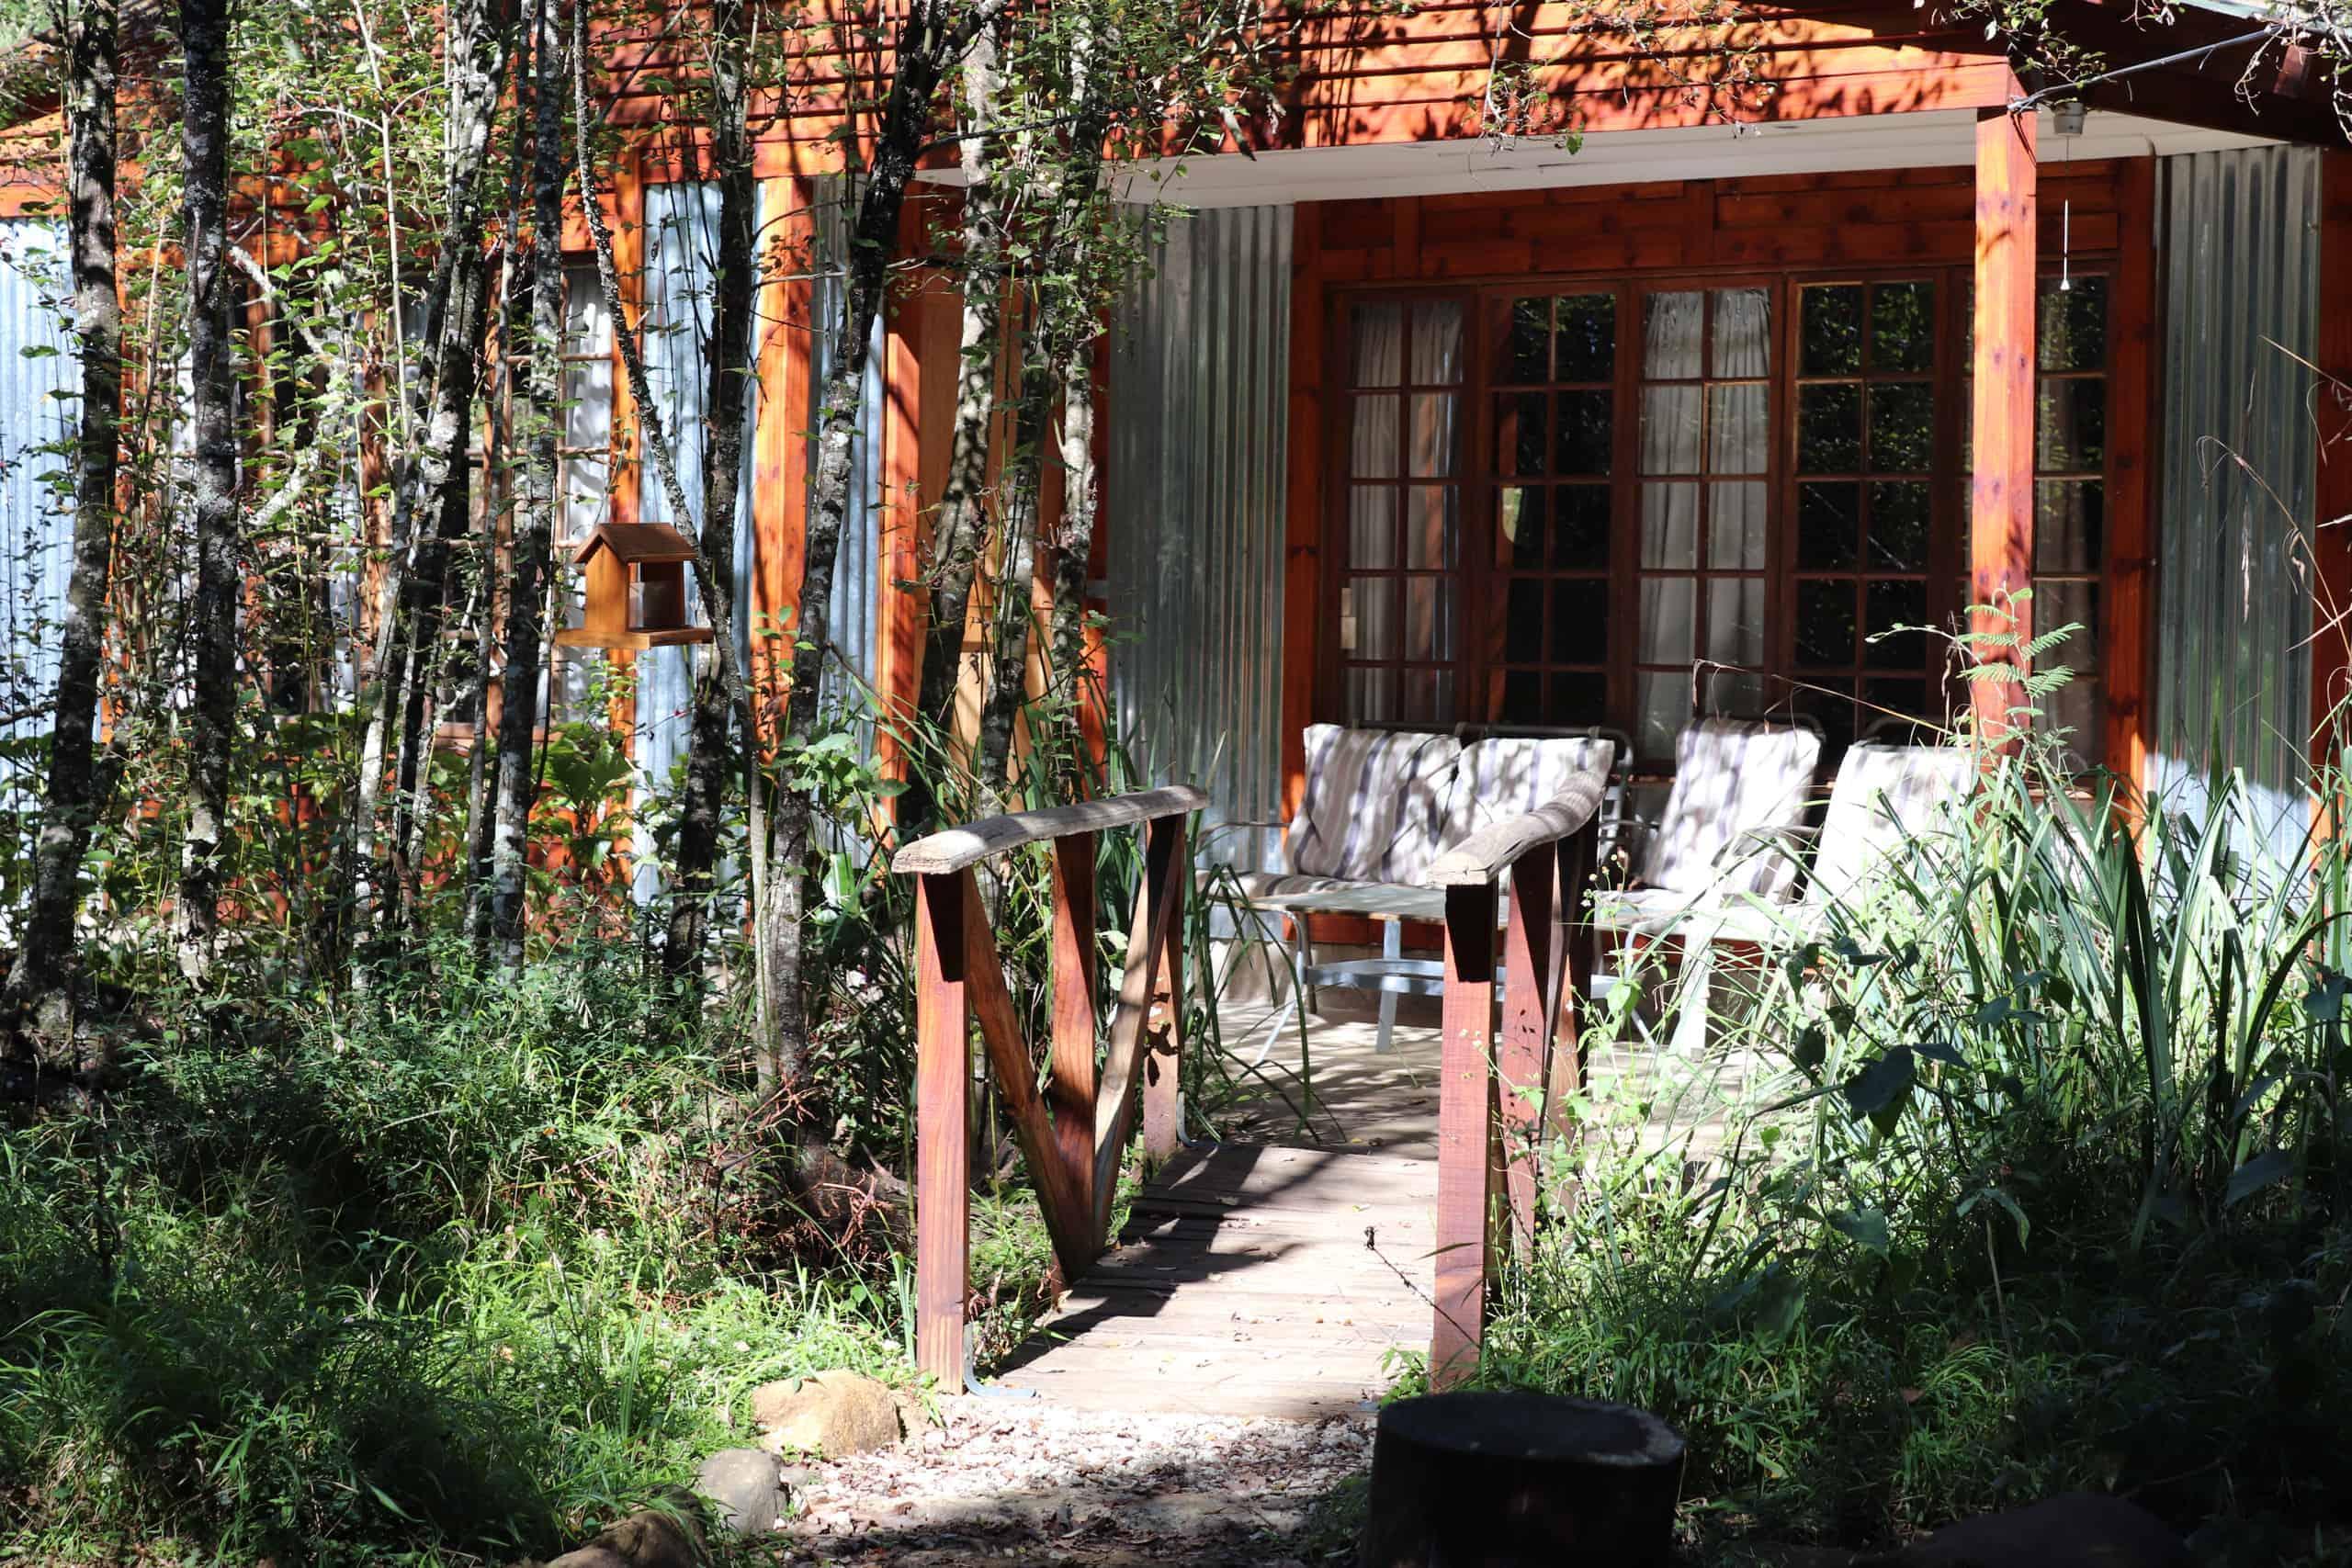 Cabin accommodation in Midlands Meander kwazulu natal